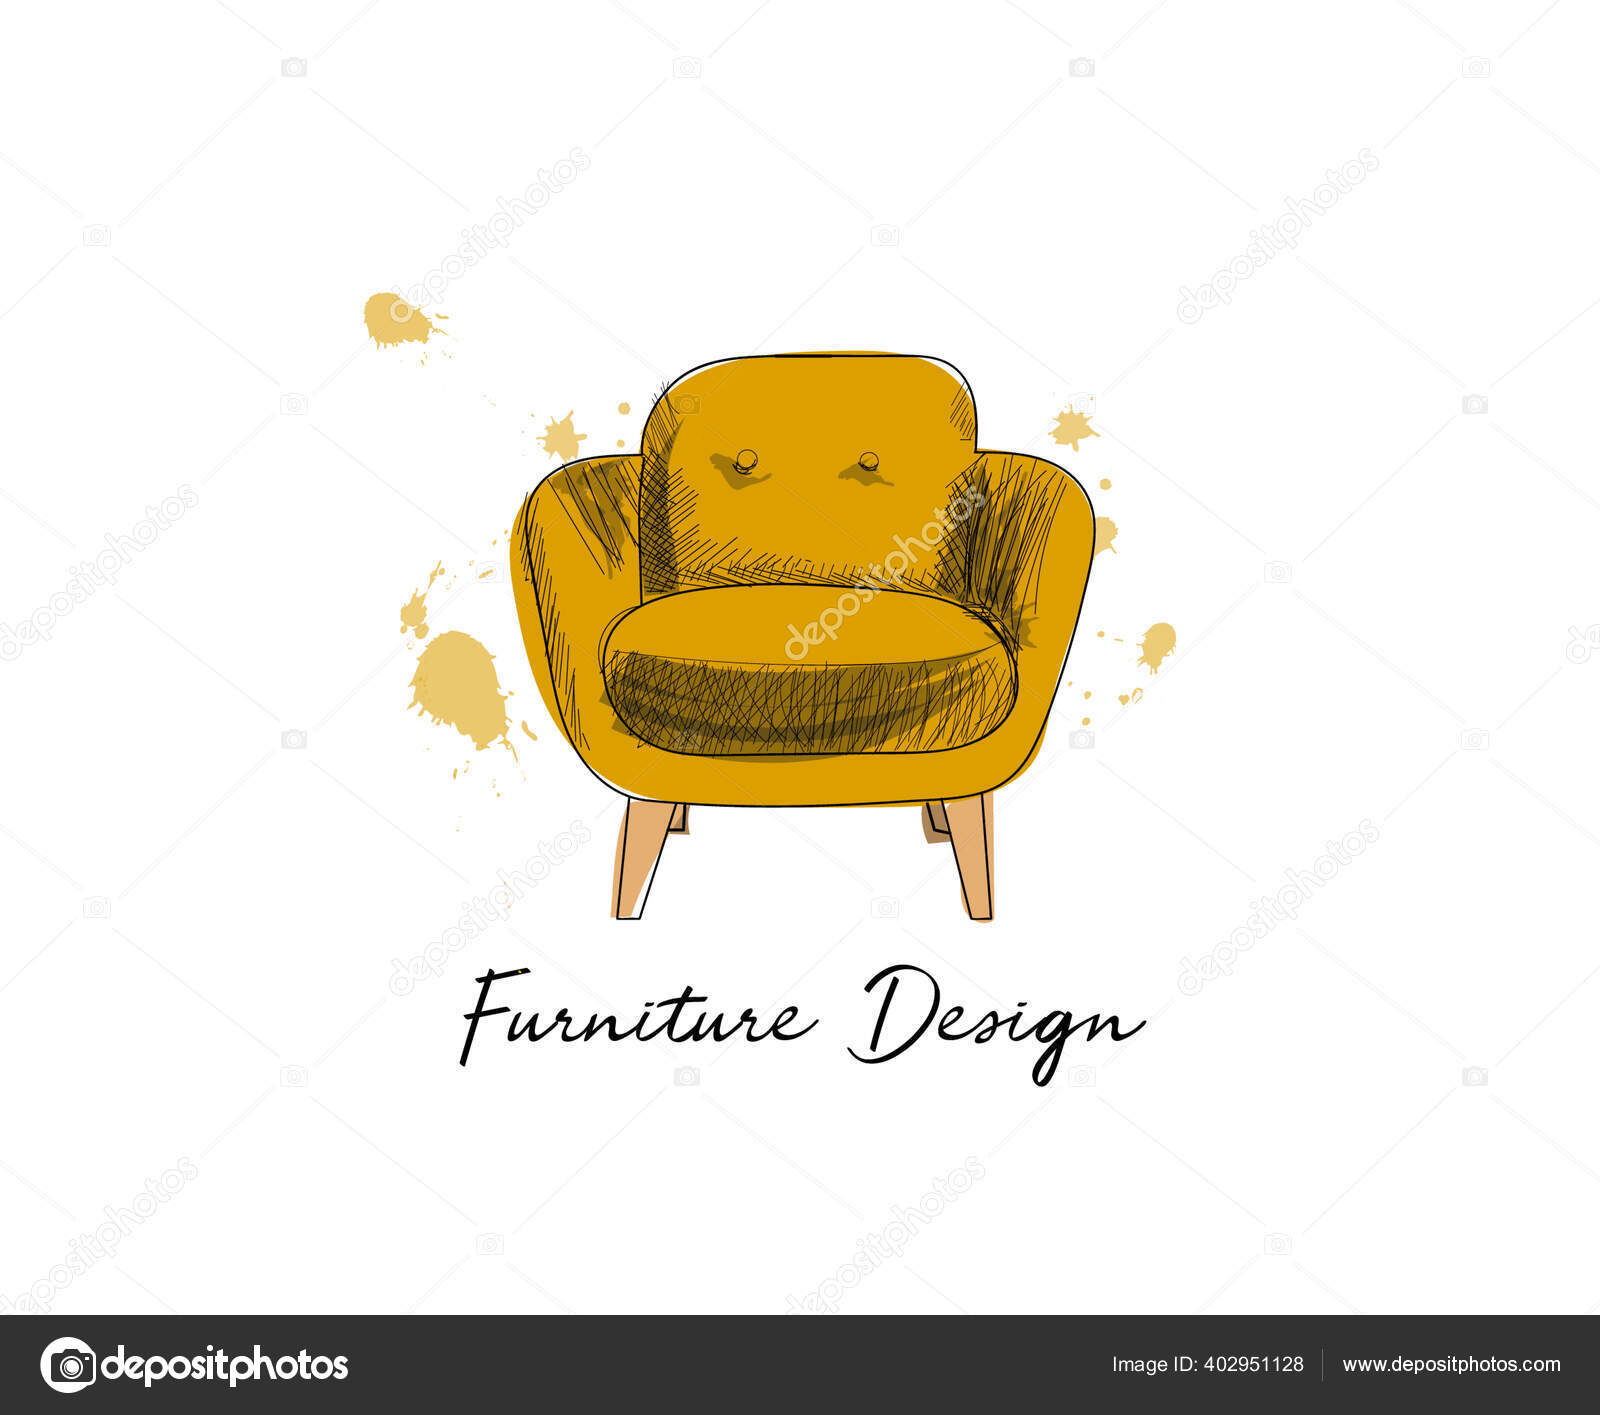 Armchair Sketch Hand Drawn Chair Vector Furniture Illustration Mid Century Vector Image By Joanna Rosado Gmail Com Vector Stock 402951128